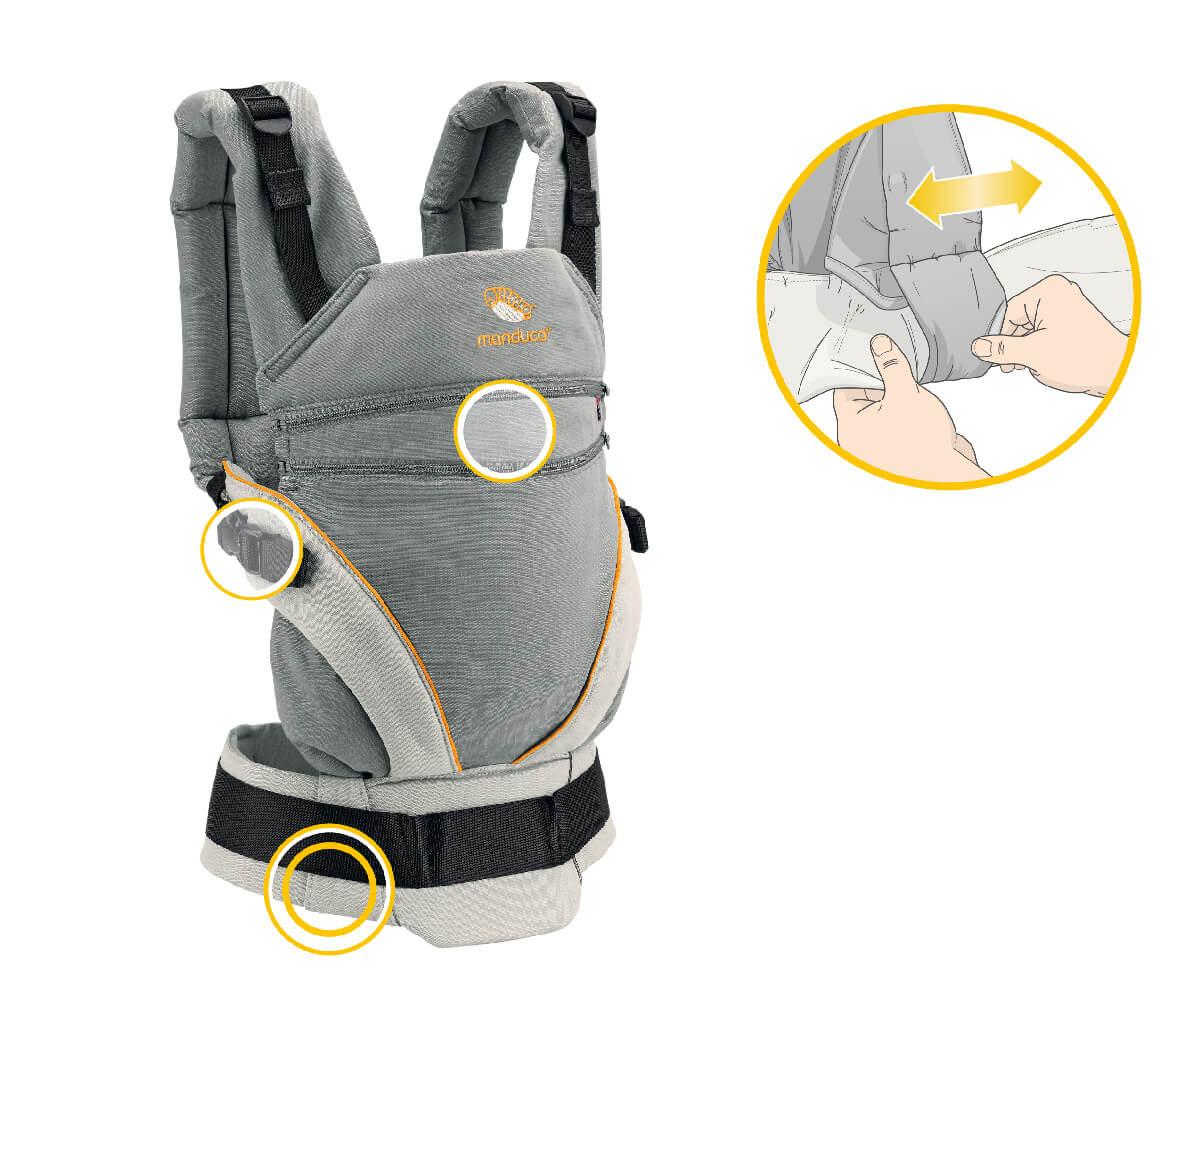 mochila ergonomica portabebes manduca